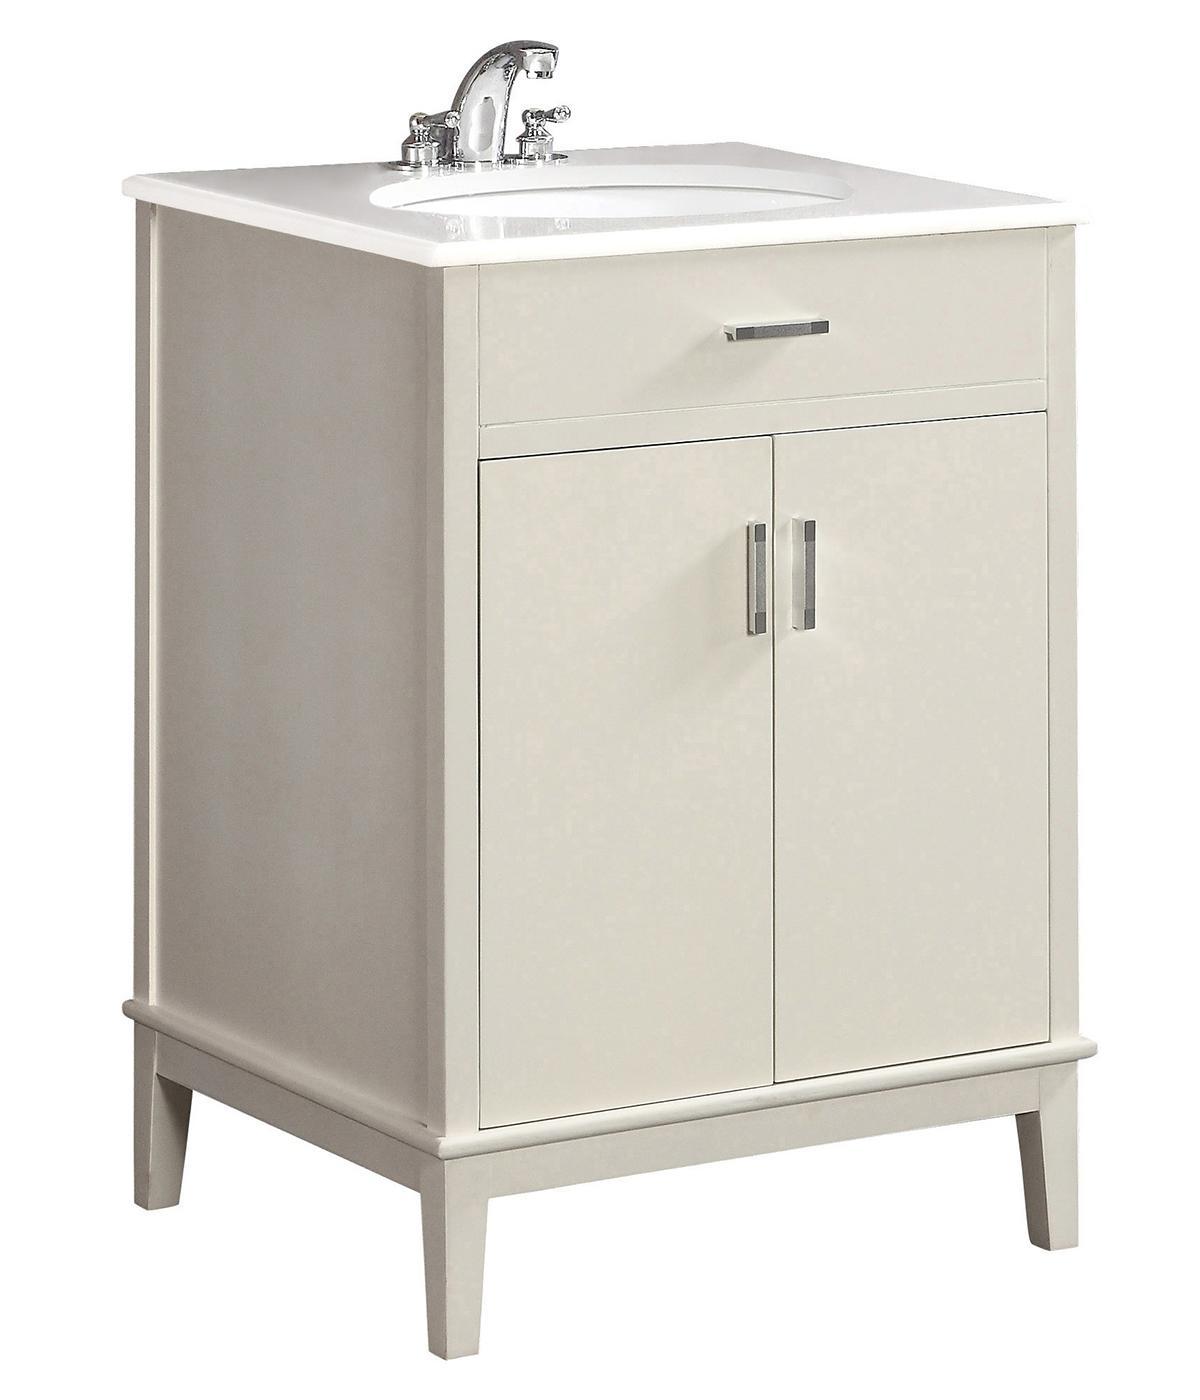 Urban loft 24 bath vanity with quartz marble top for Bathroom cabinets urban ladder